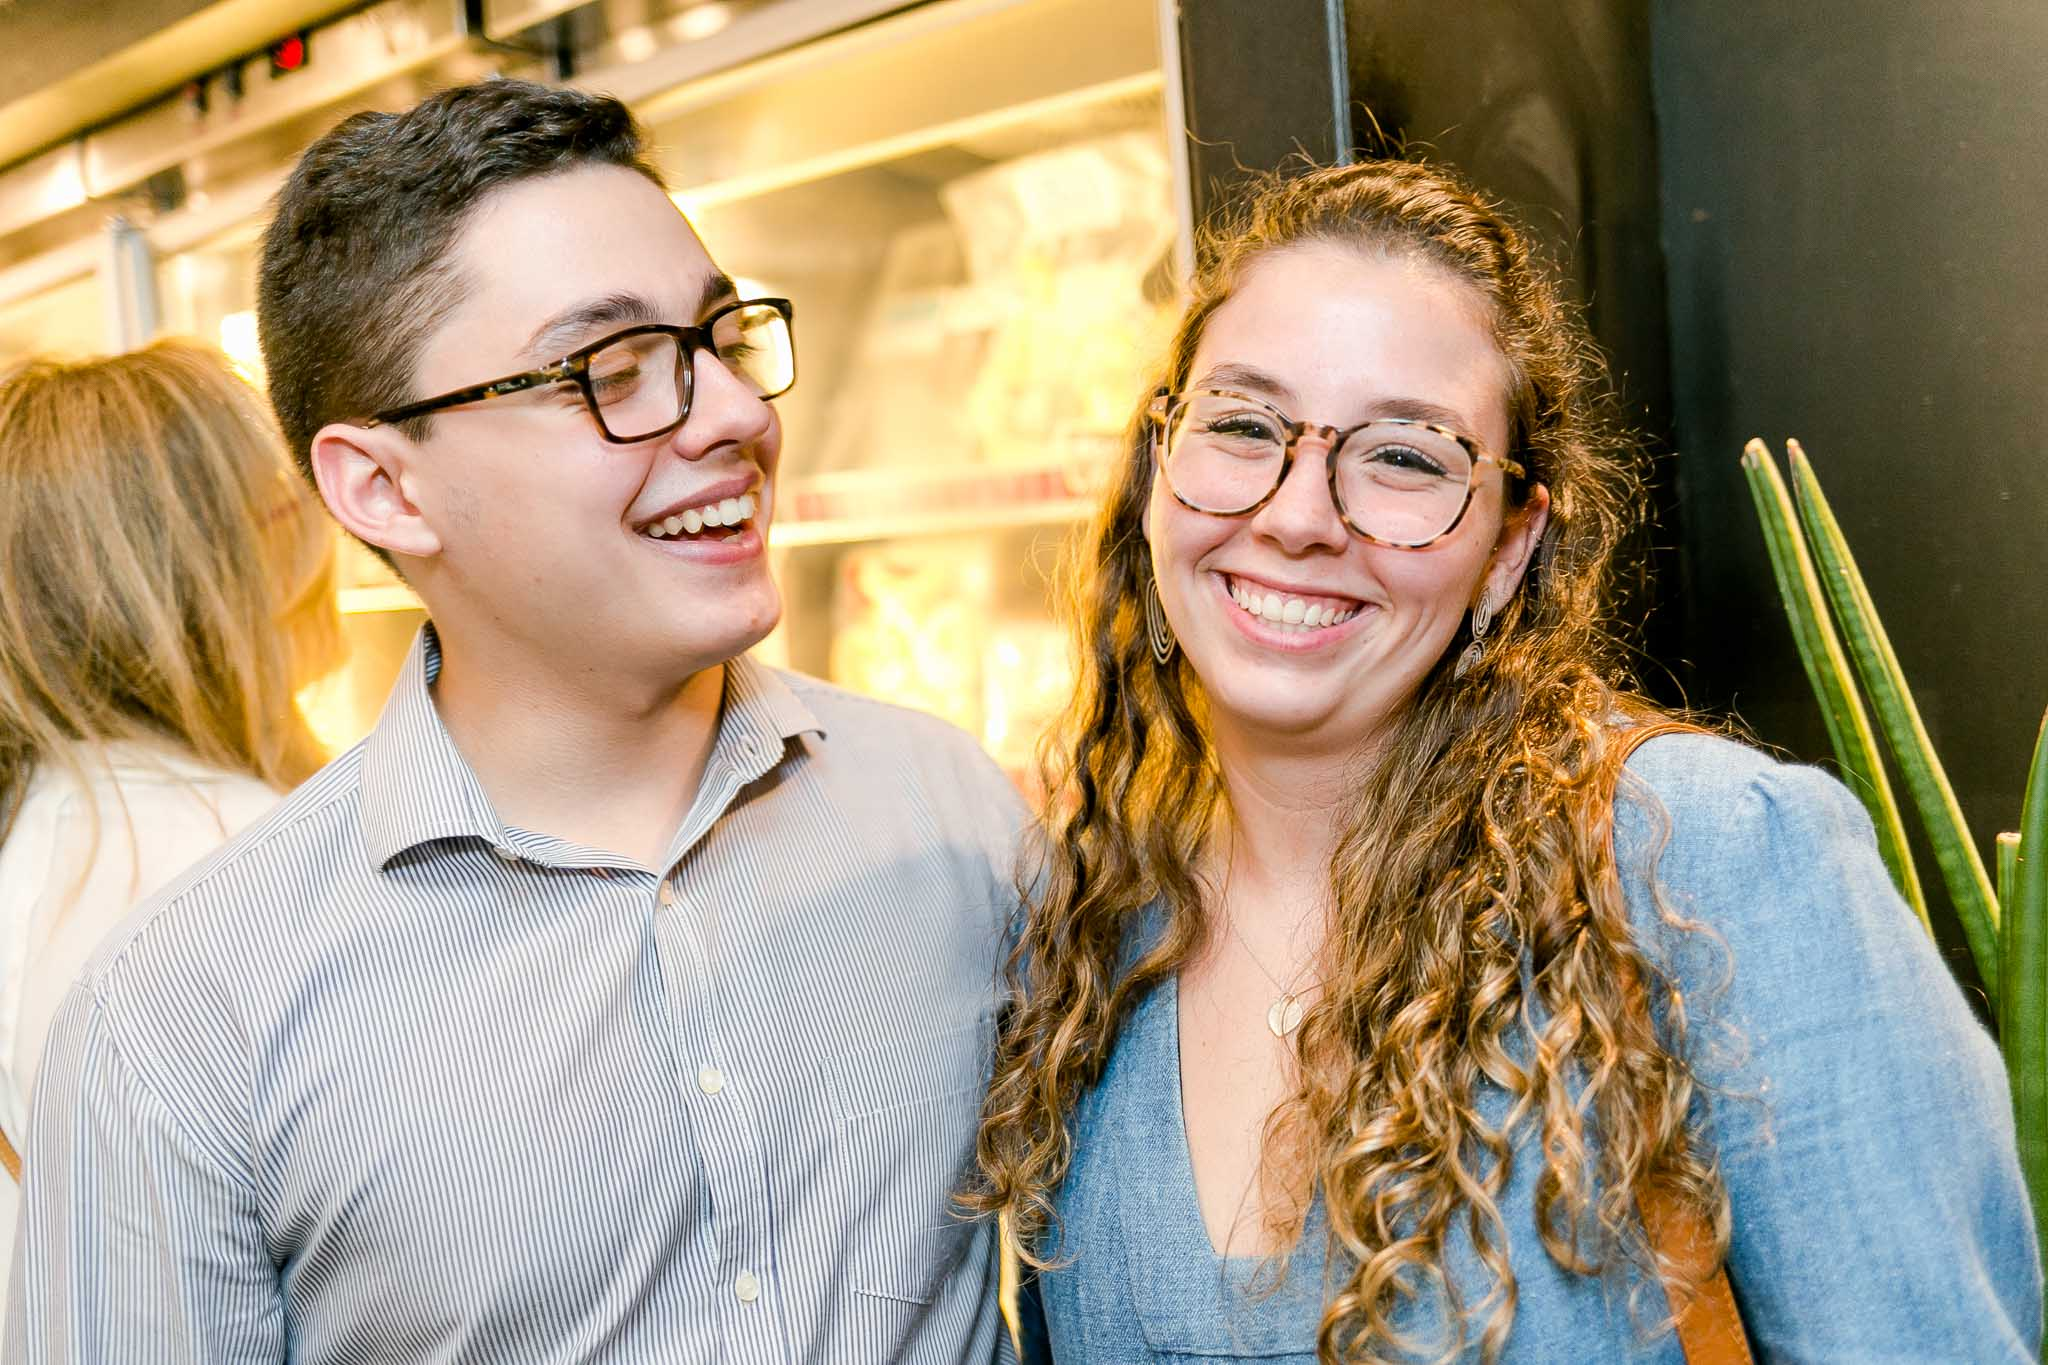 Pedro Araujo e Luyza De Luca